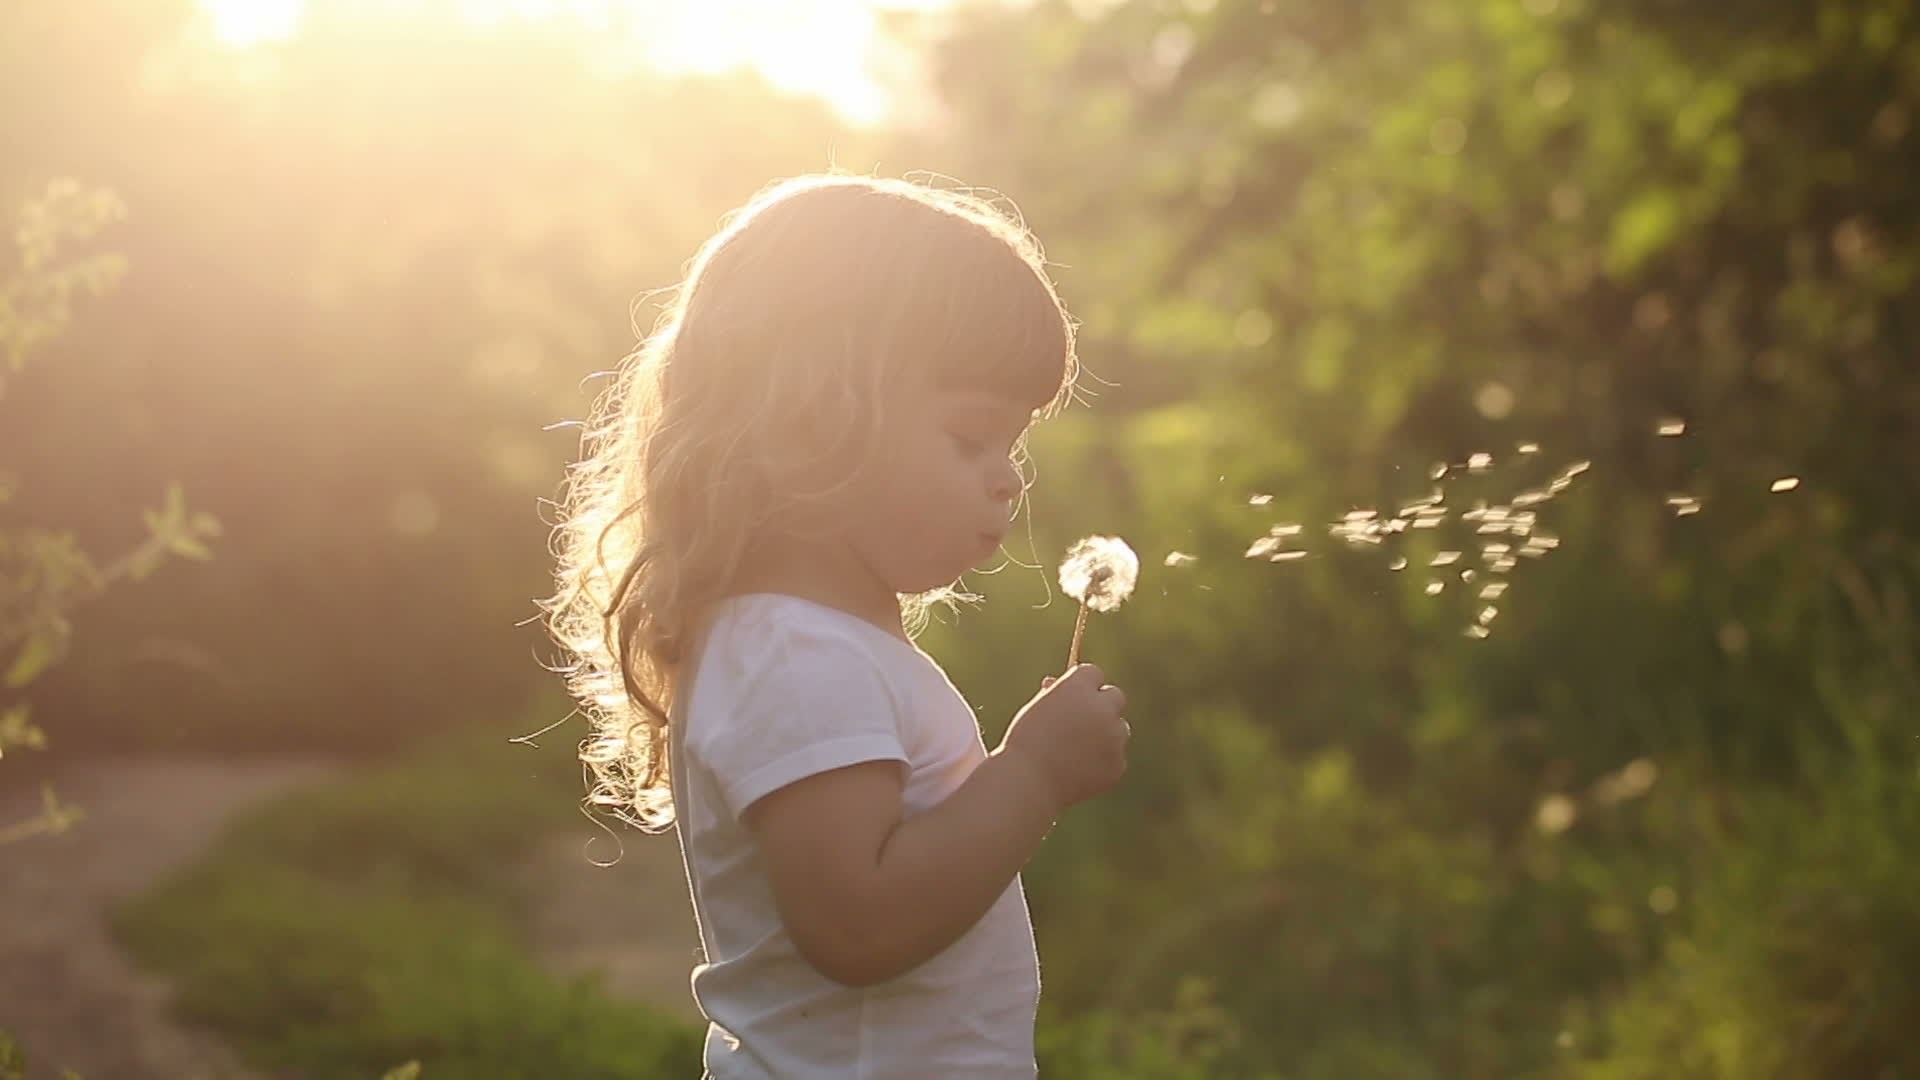 Res: 1920x1080, Cute little girl is blowing on dandelion